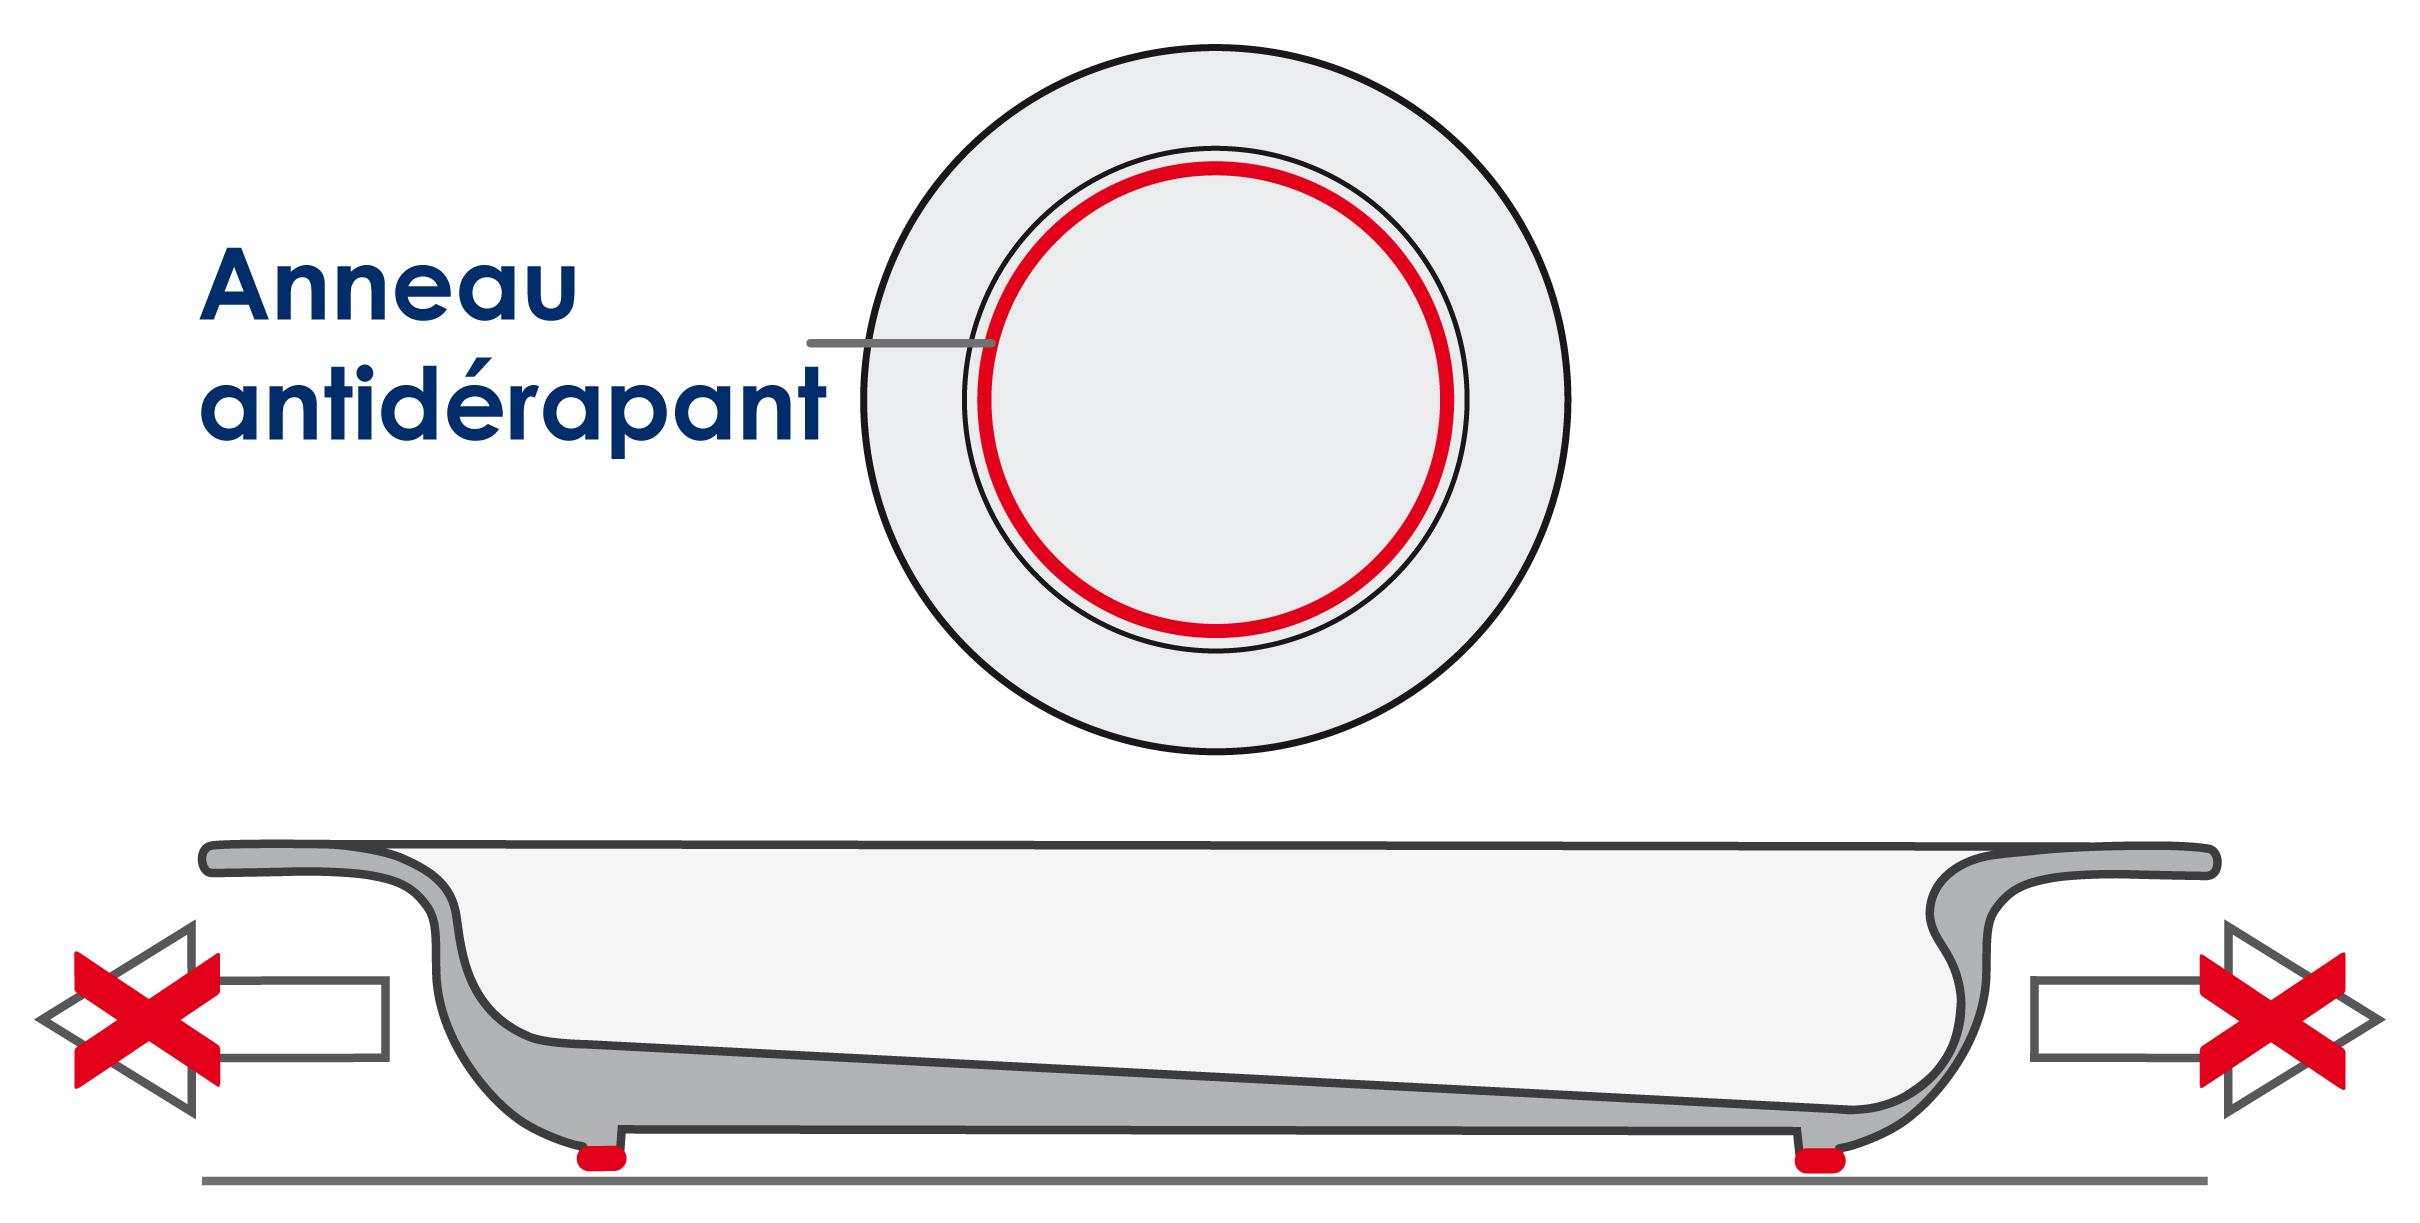 6-schema anneau antiderapant.jpg